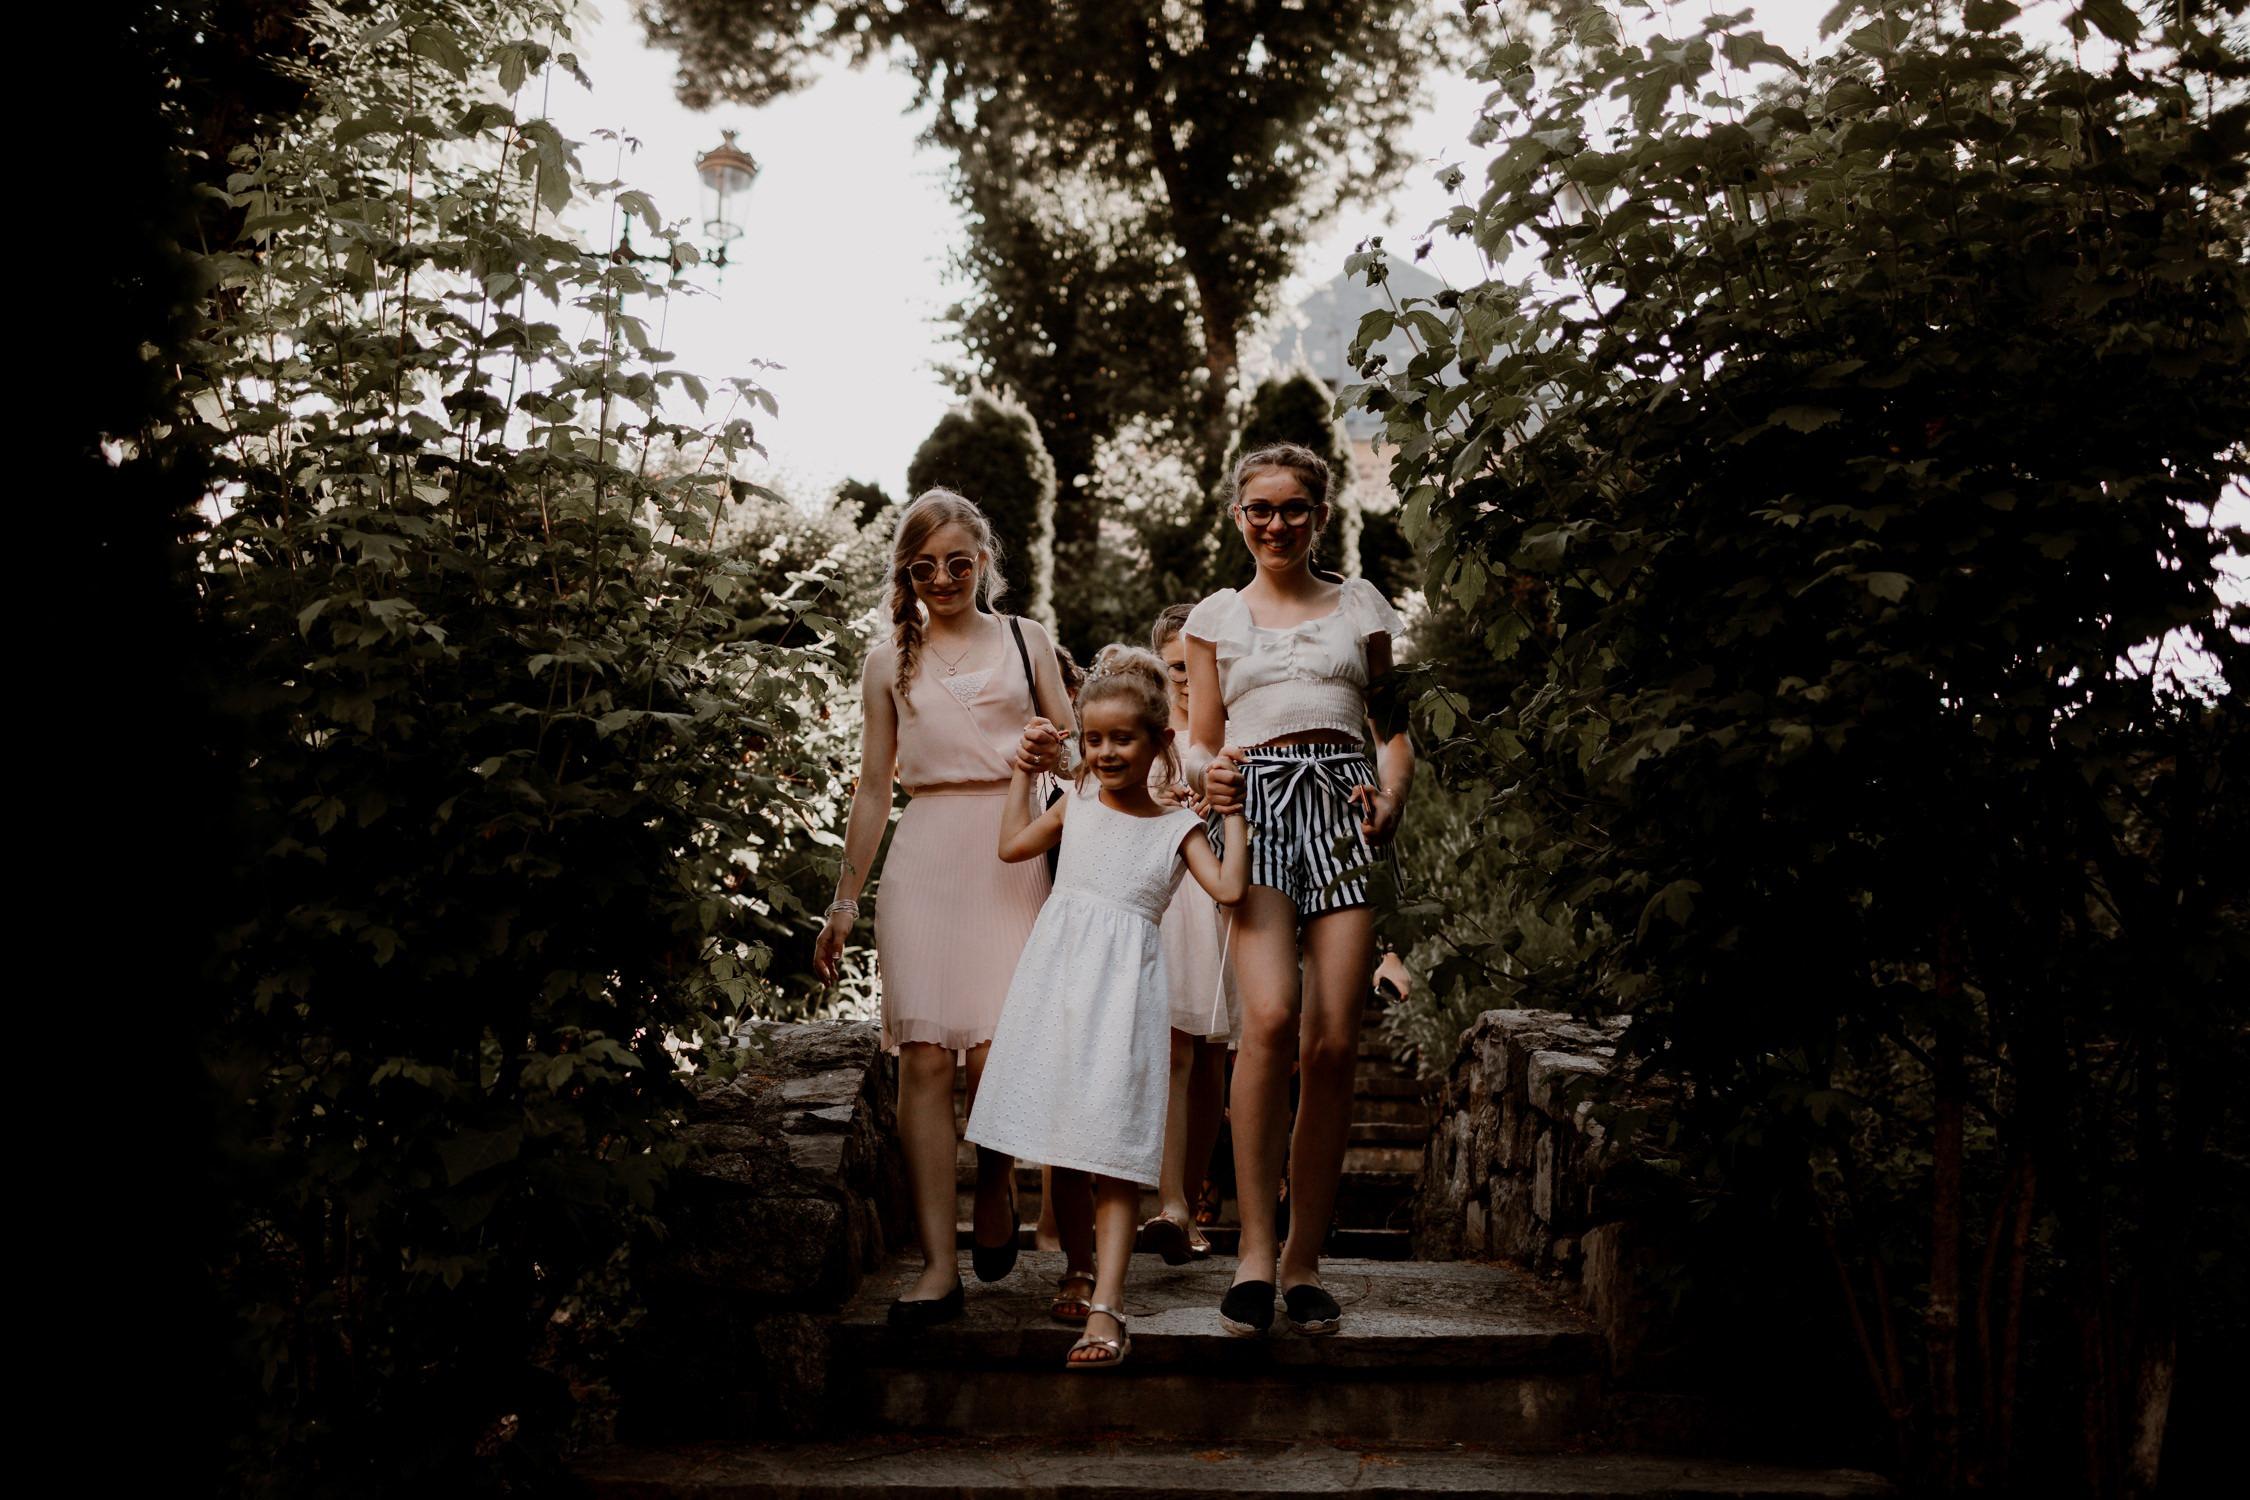 Amandine marque - photographe mariage chambéry-14